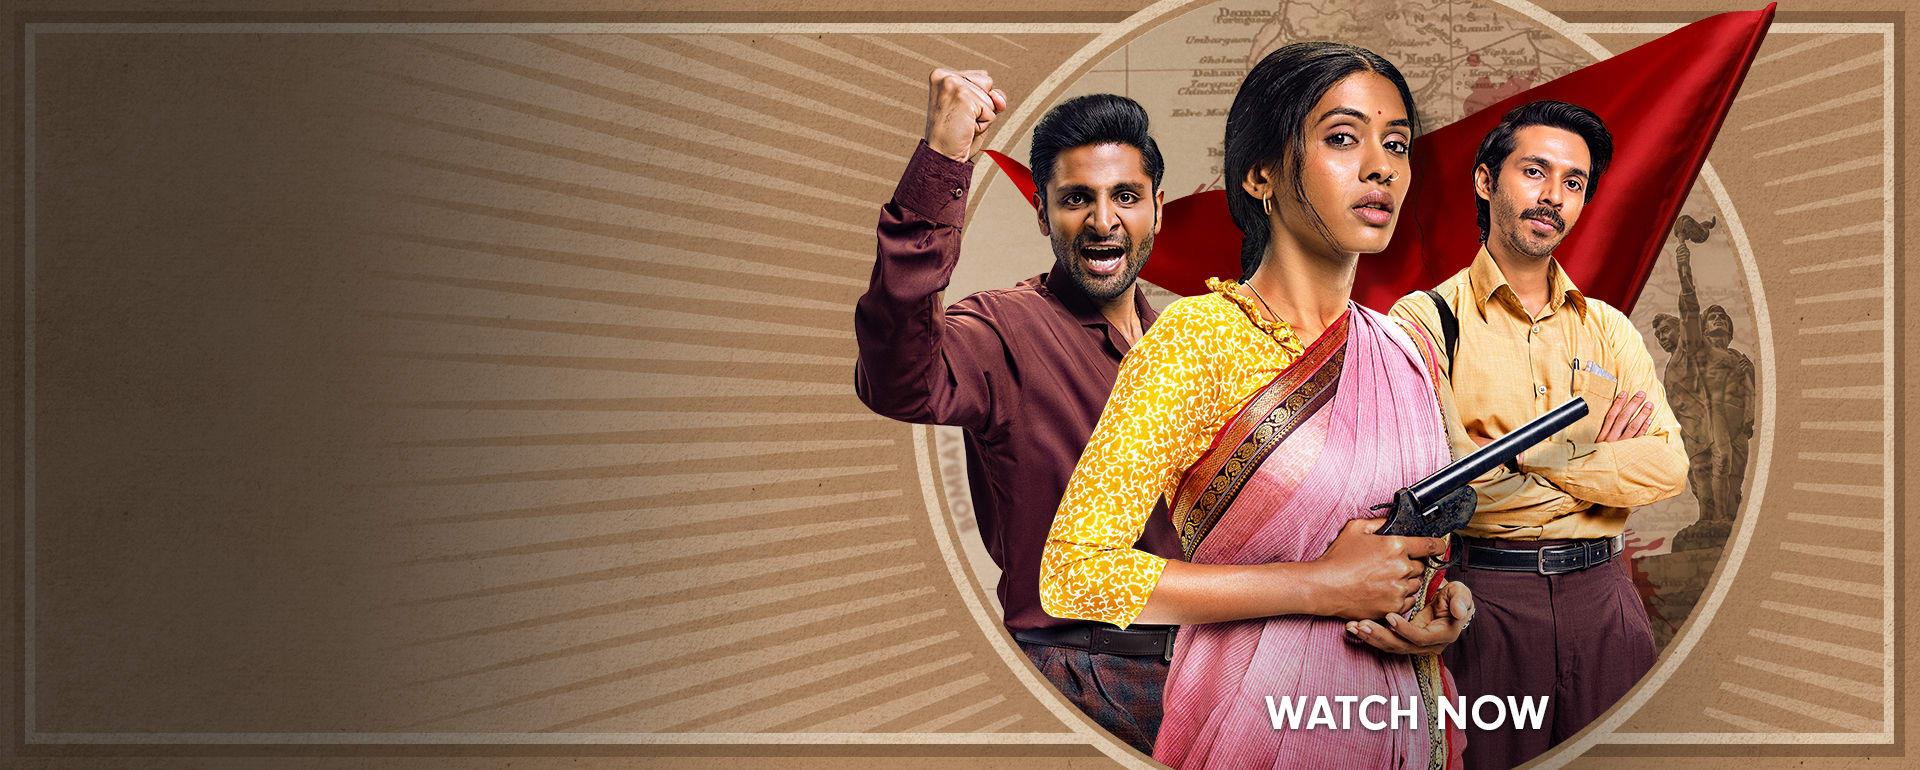 free hindi serials online watch